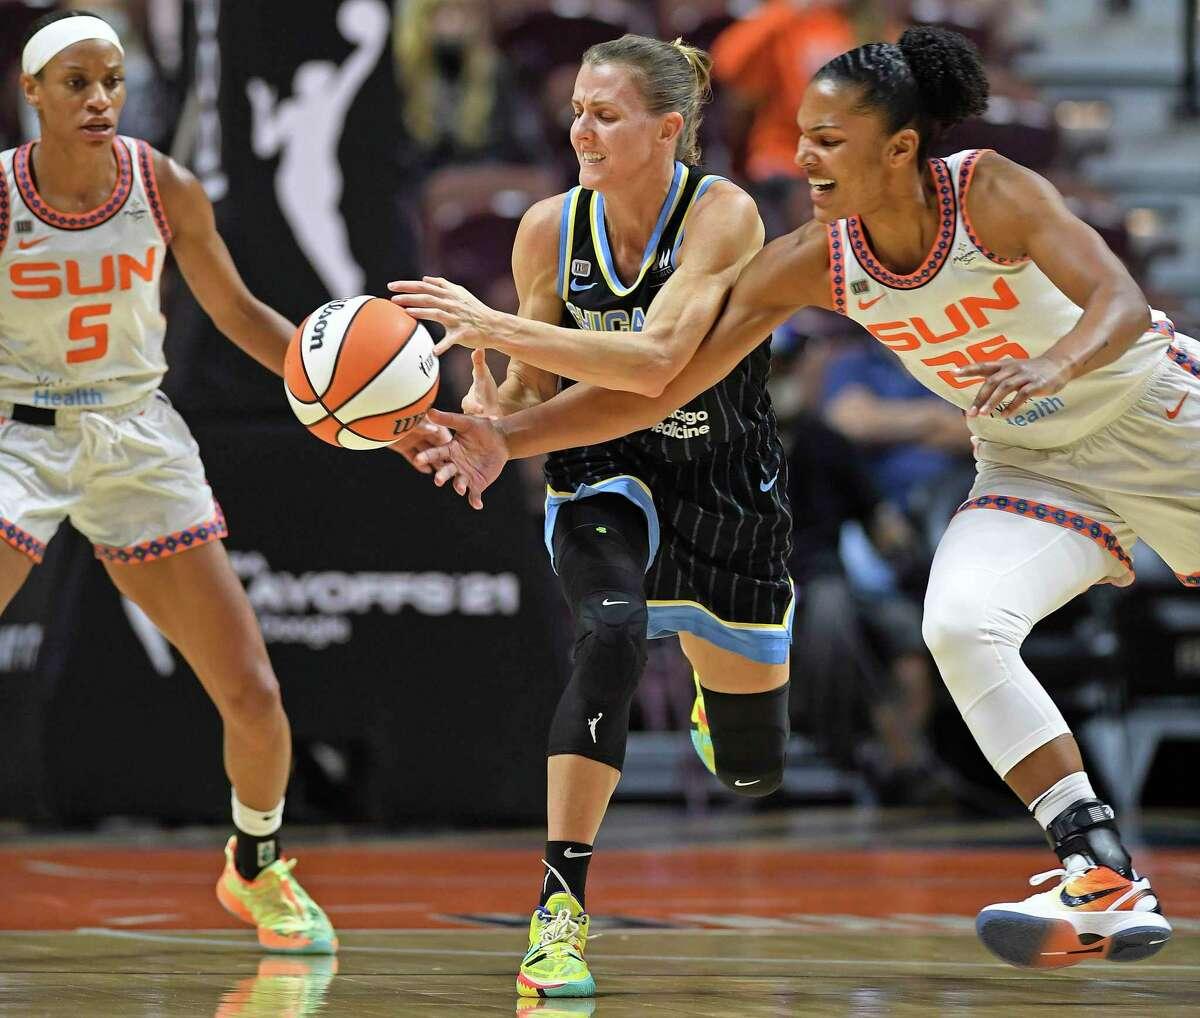 Connecticut Sun forward Alyssa Thomas (25) pokes the ball away from Chicago Sky guard Allie Quigley during a WNBA playoff basketball game Tuesday, Sept. 28, 2021 at Mohegan Sun Arena in Uncasville, Conn. (Sean D. Elliot/The Day via AP)